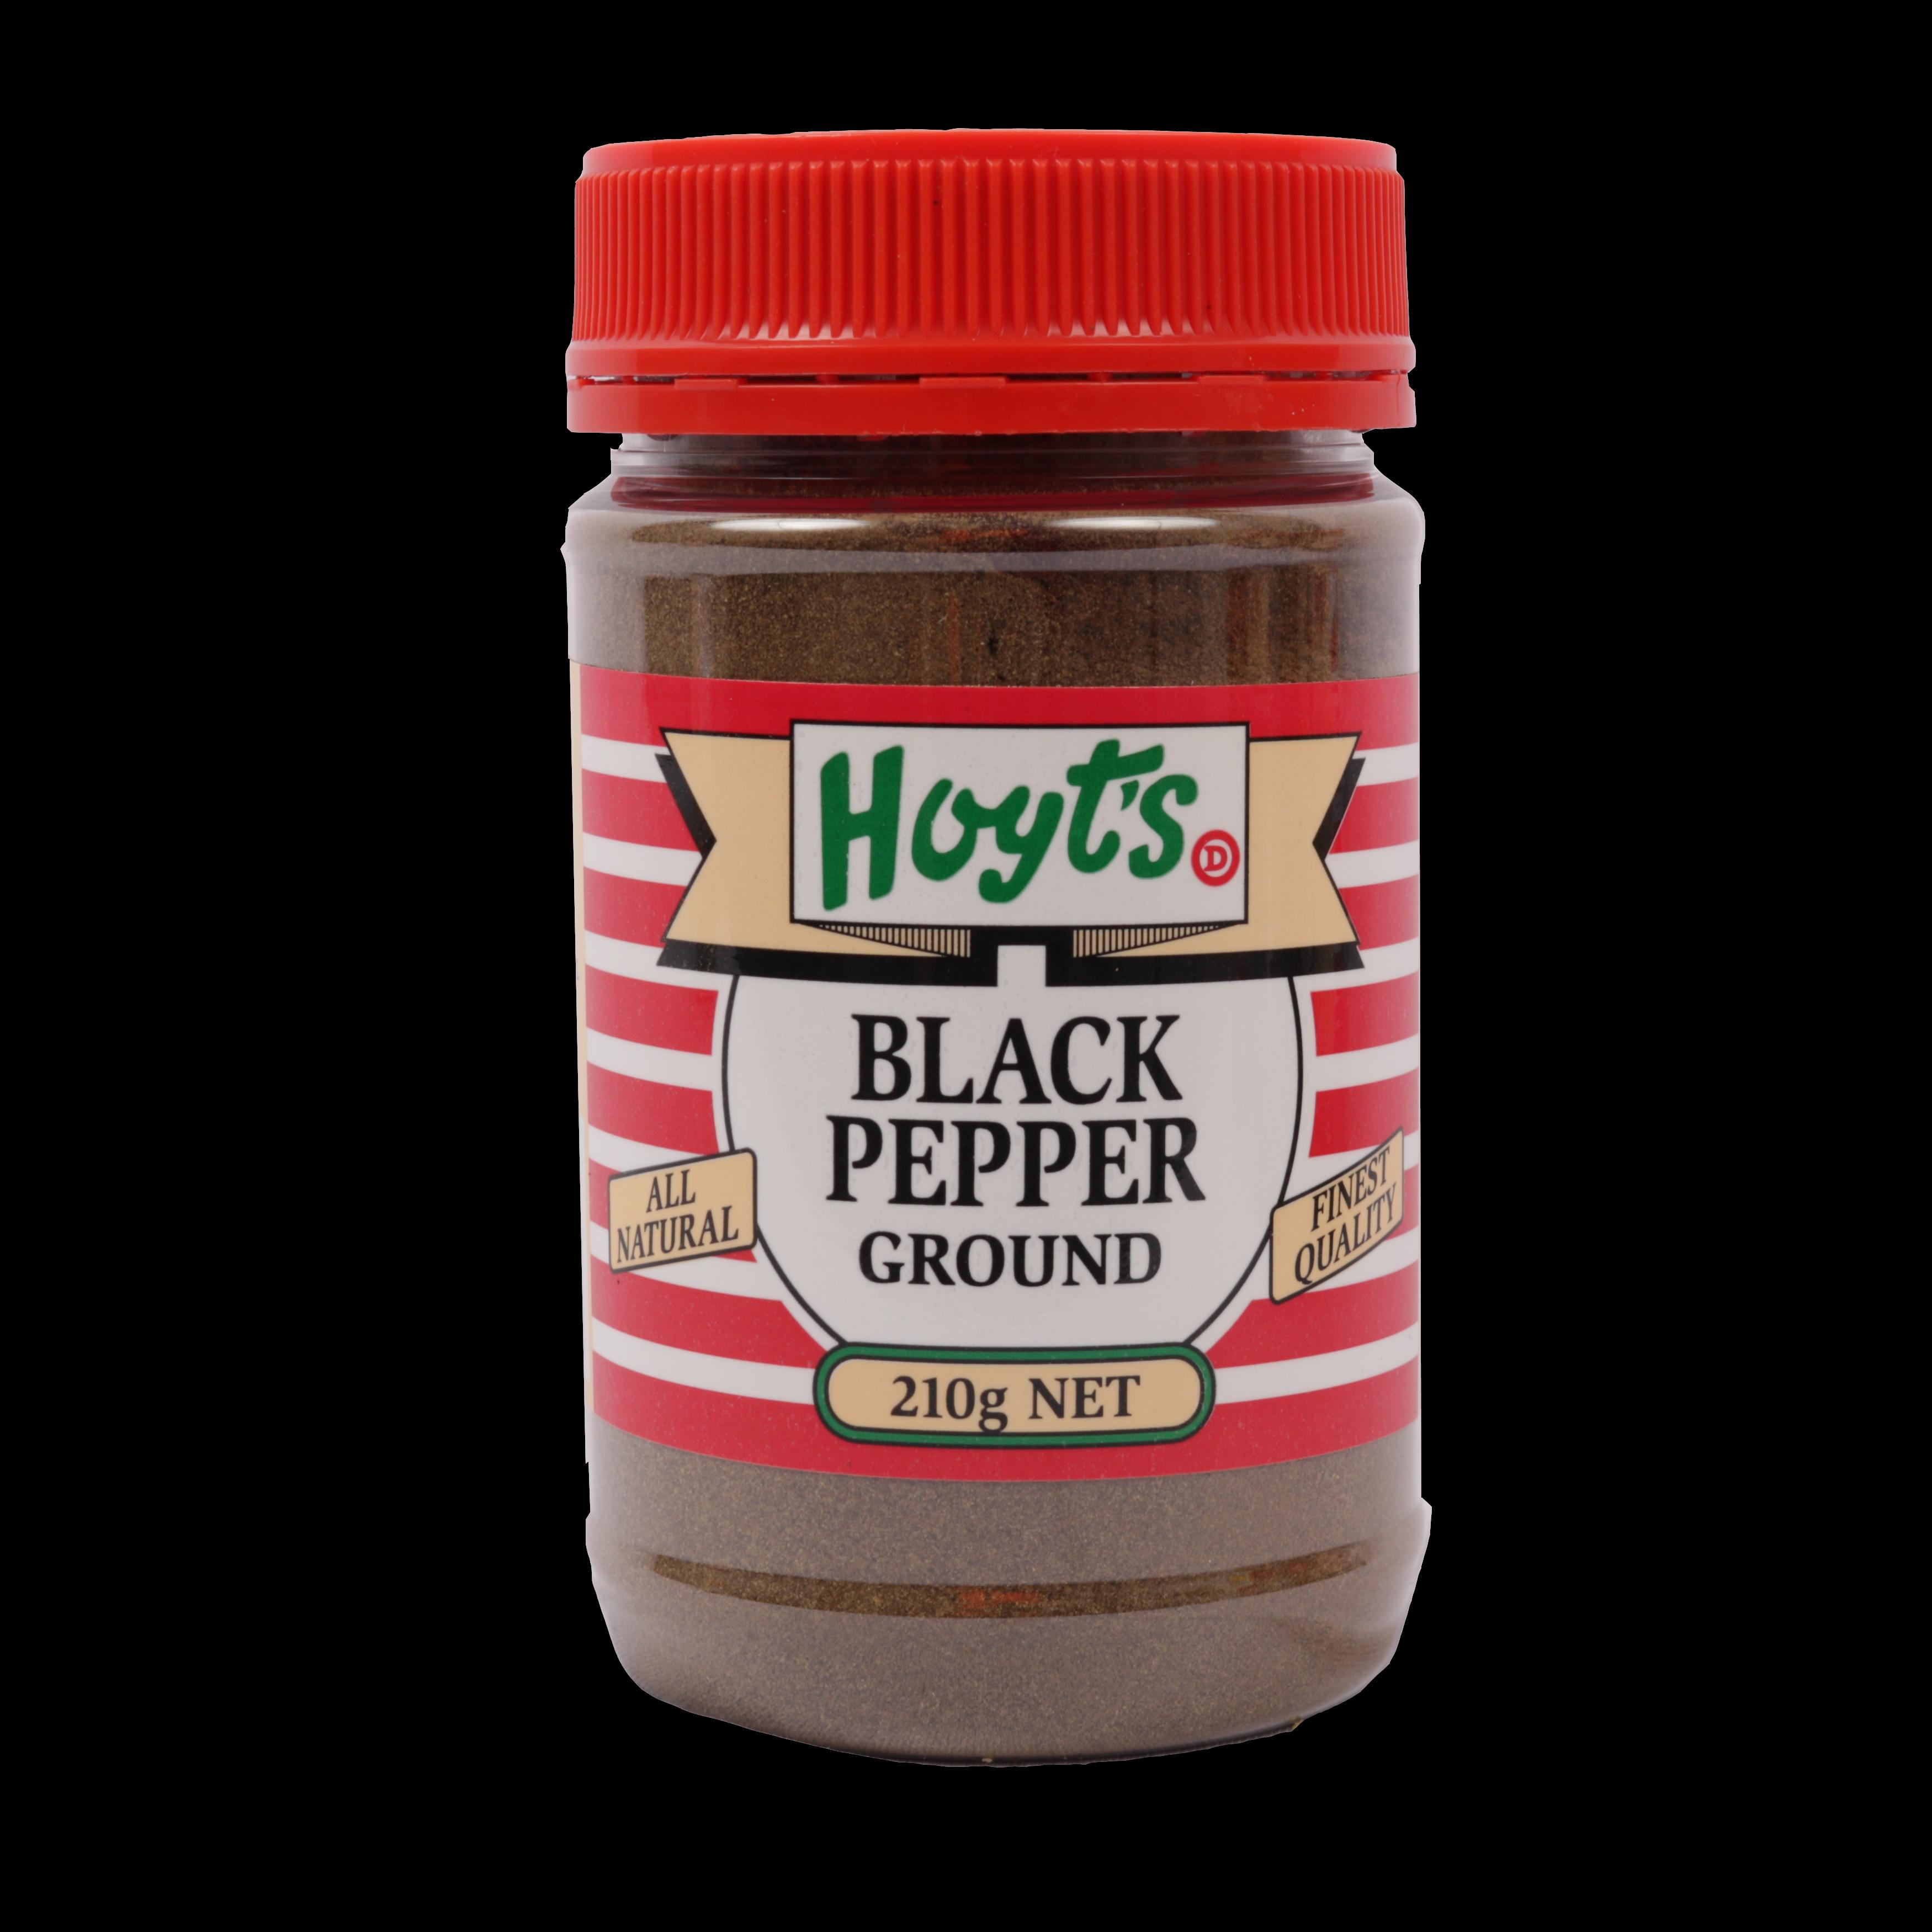 Hoyts Black Pepper Ground 210g